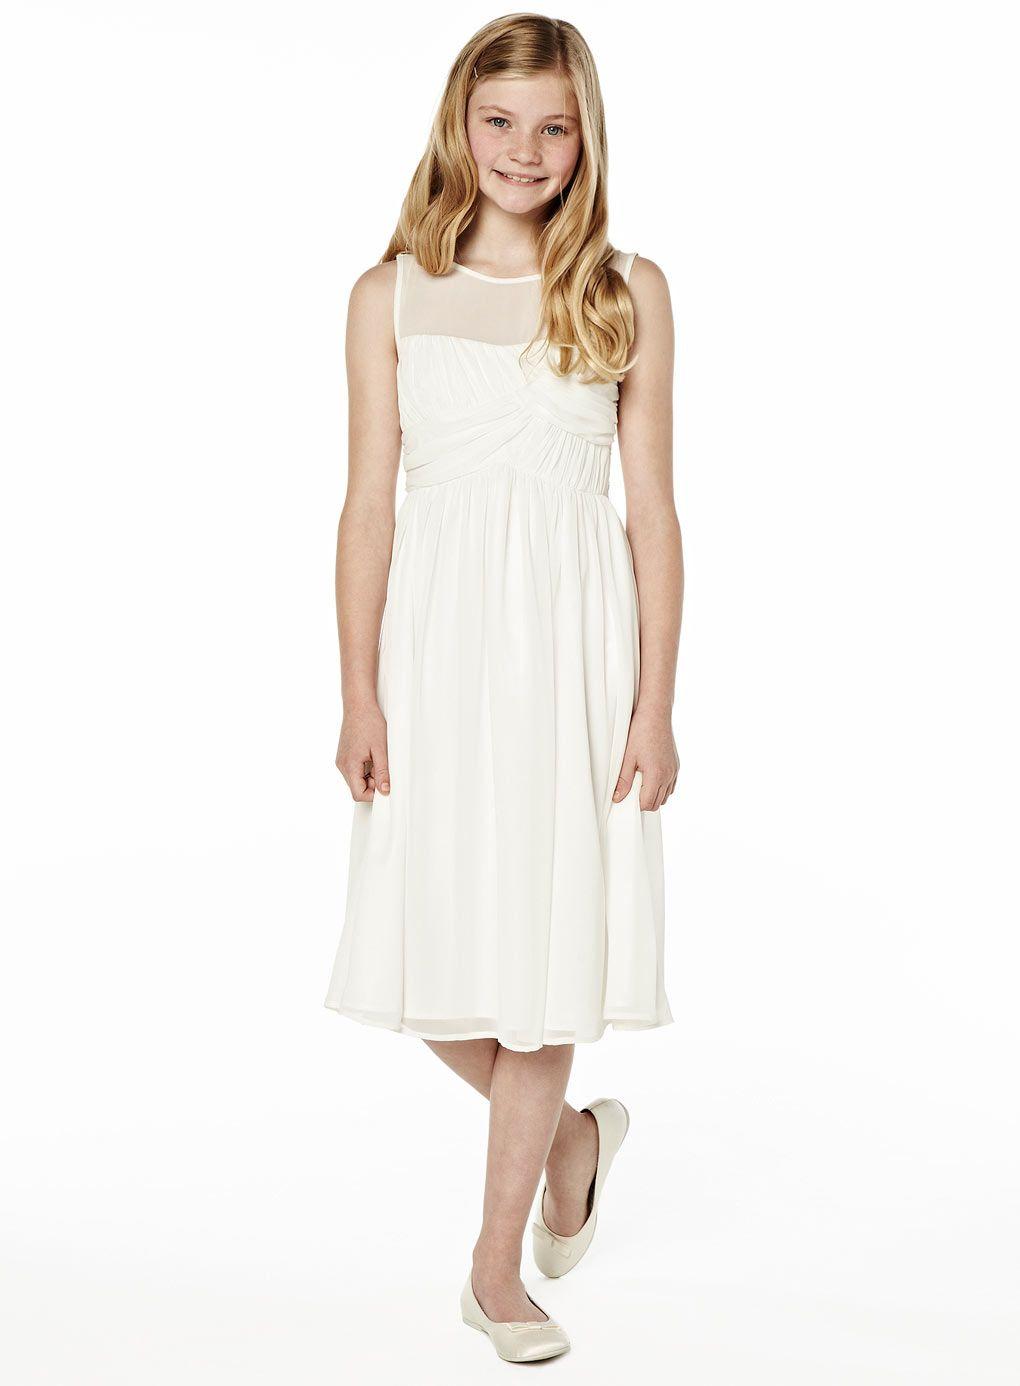 product img | bridesmaids dresses | Pinterest